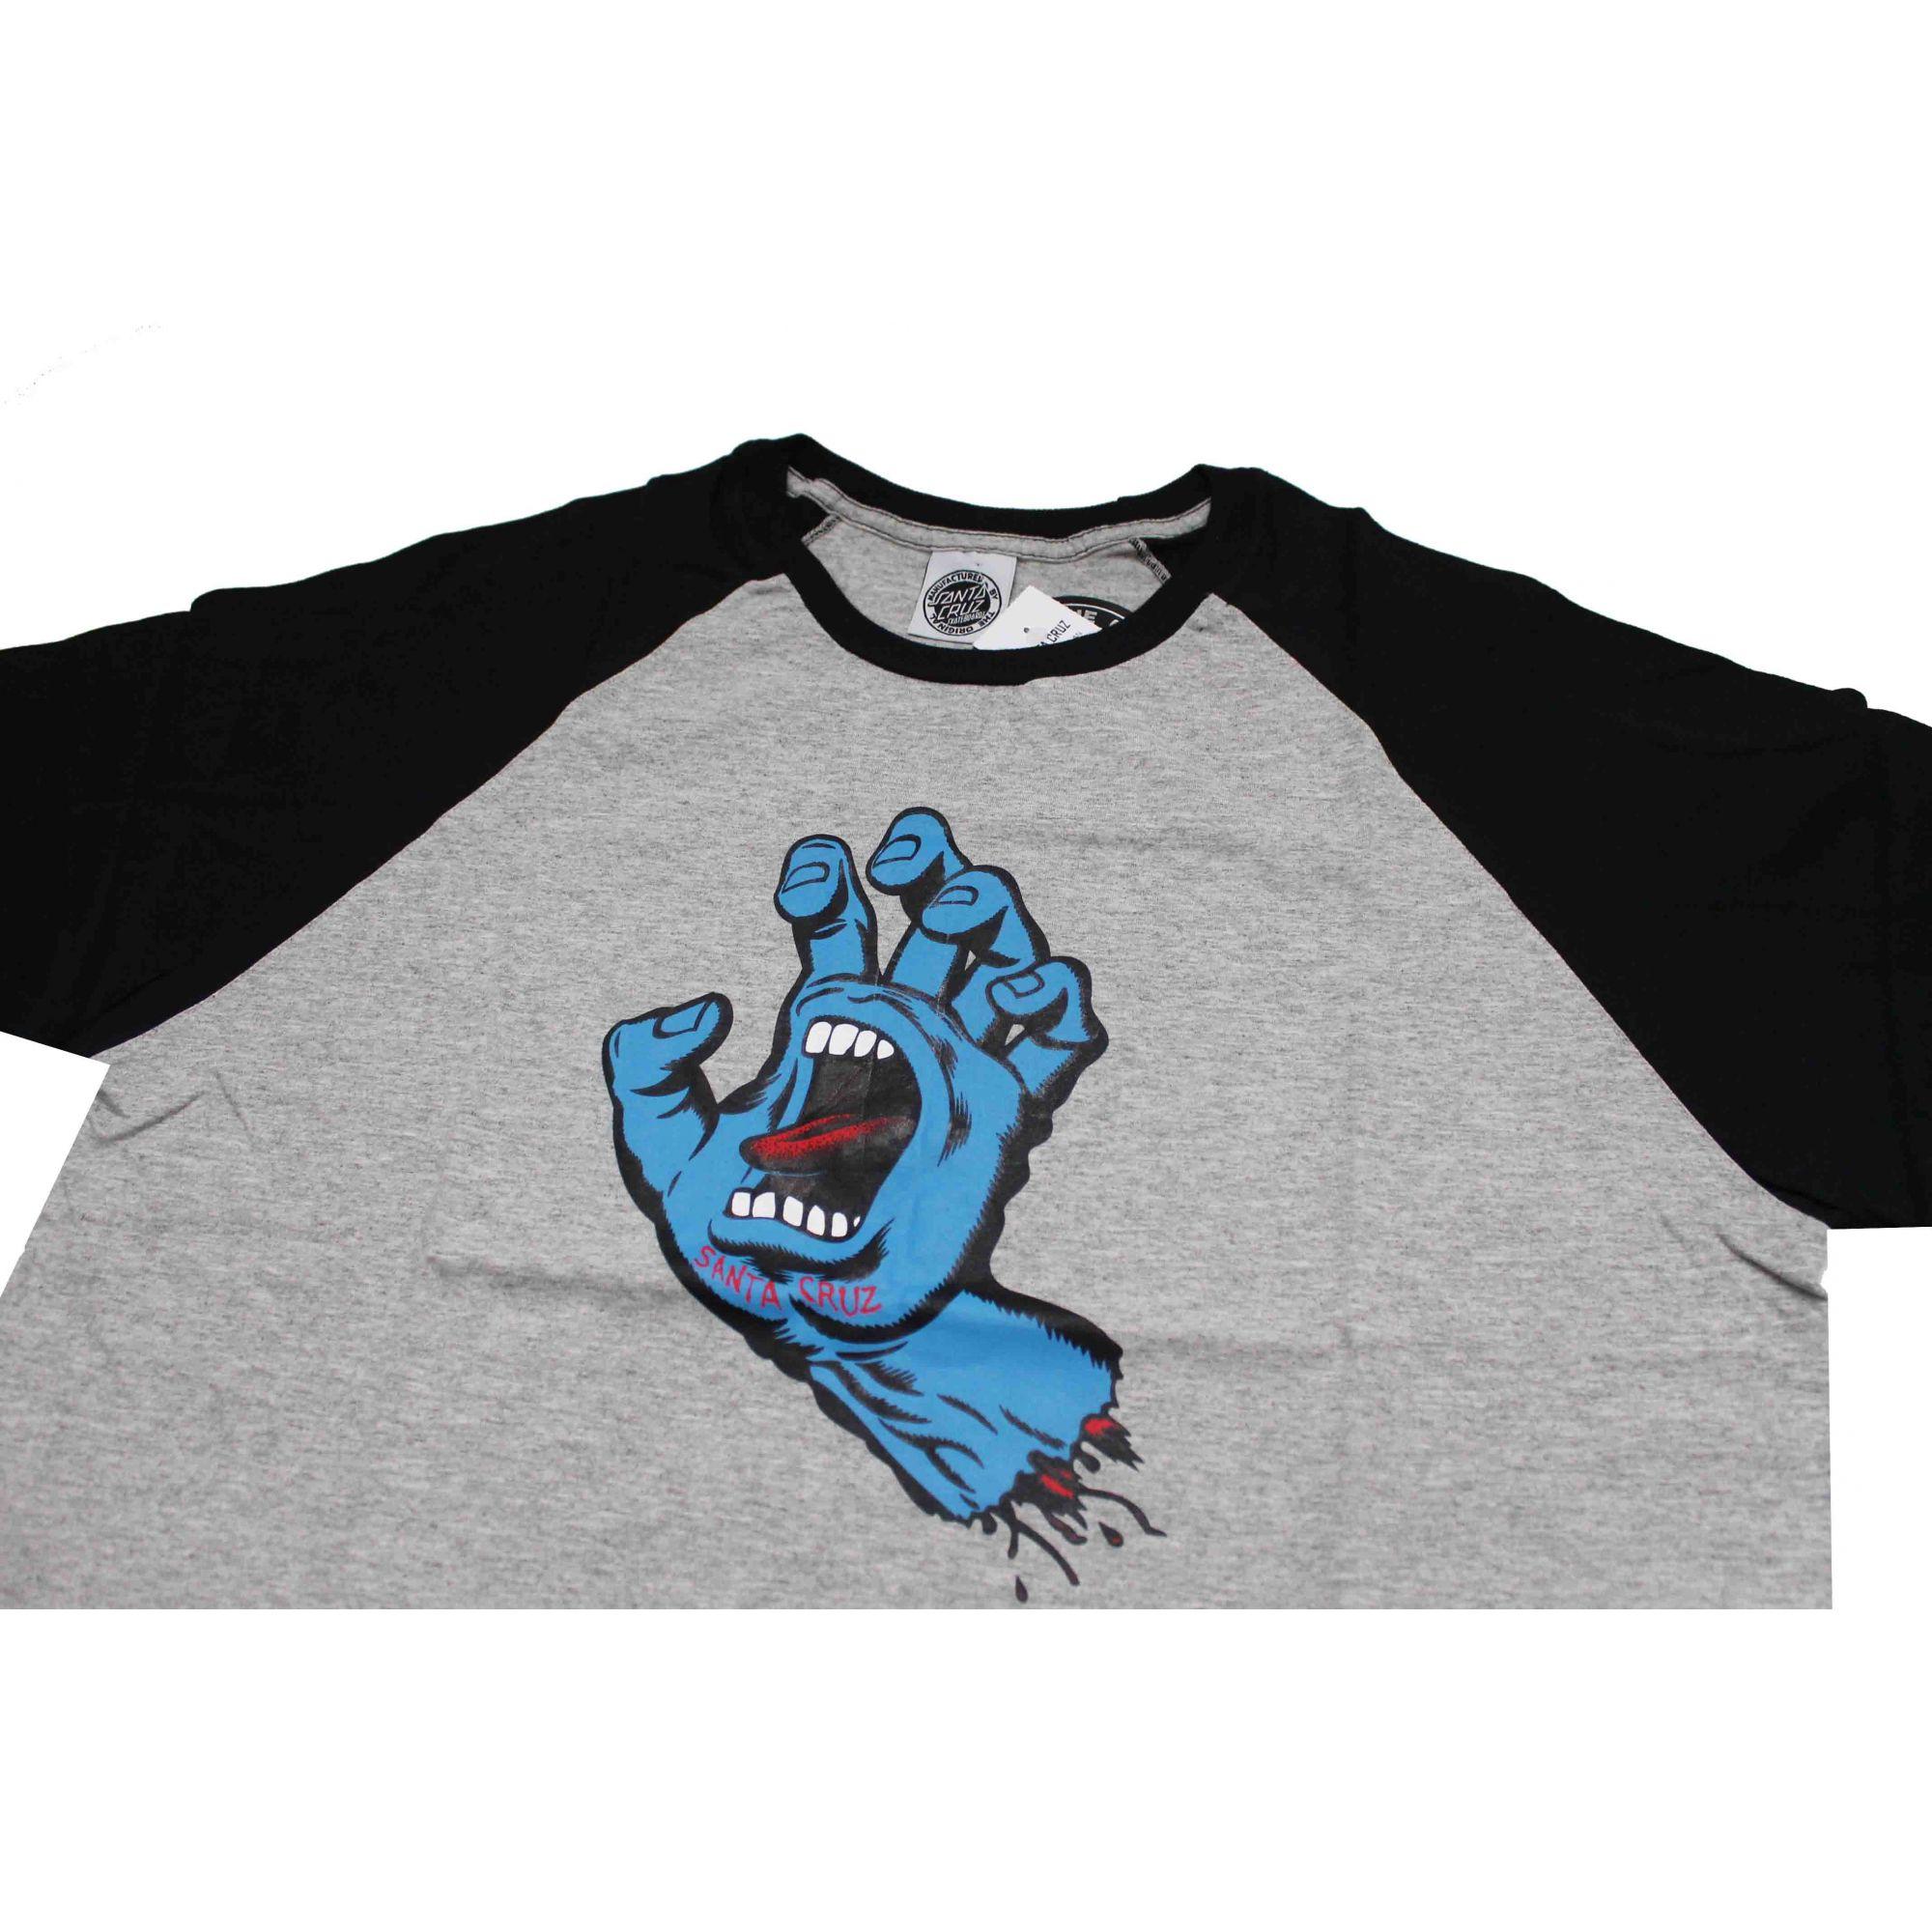 Camiseta Santa Cruz Raglan Screaming Grey/Black